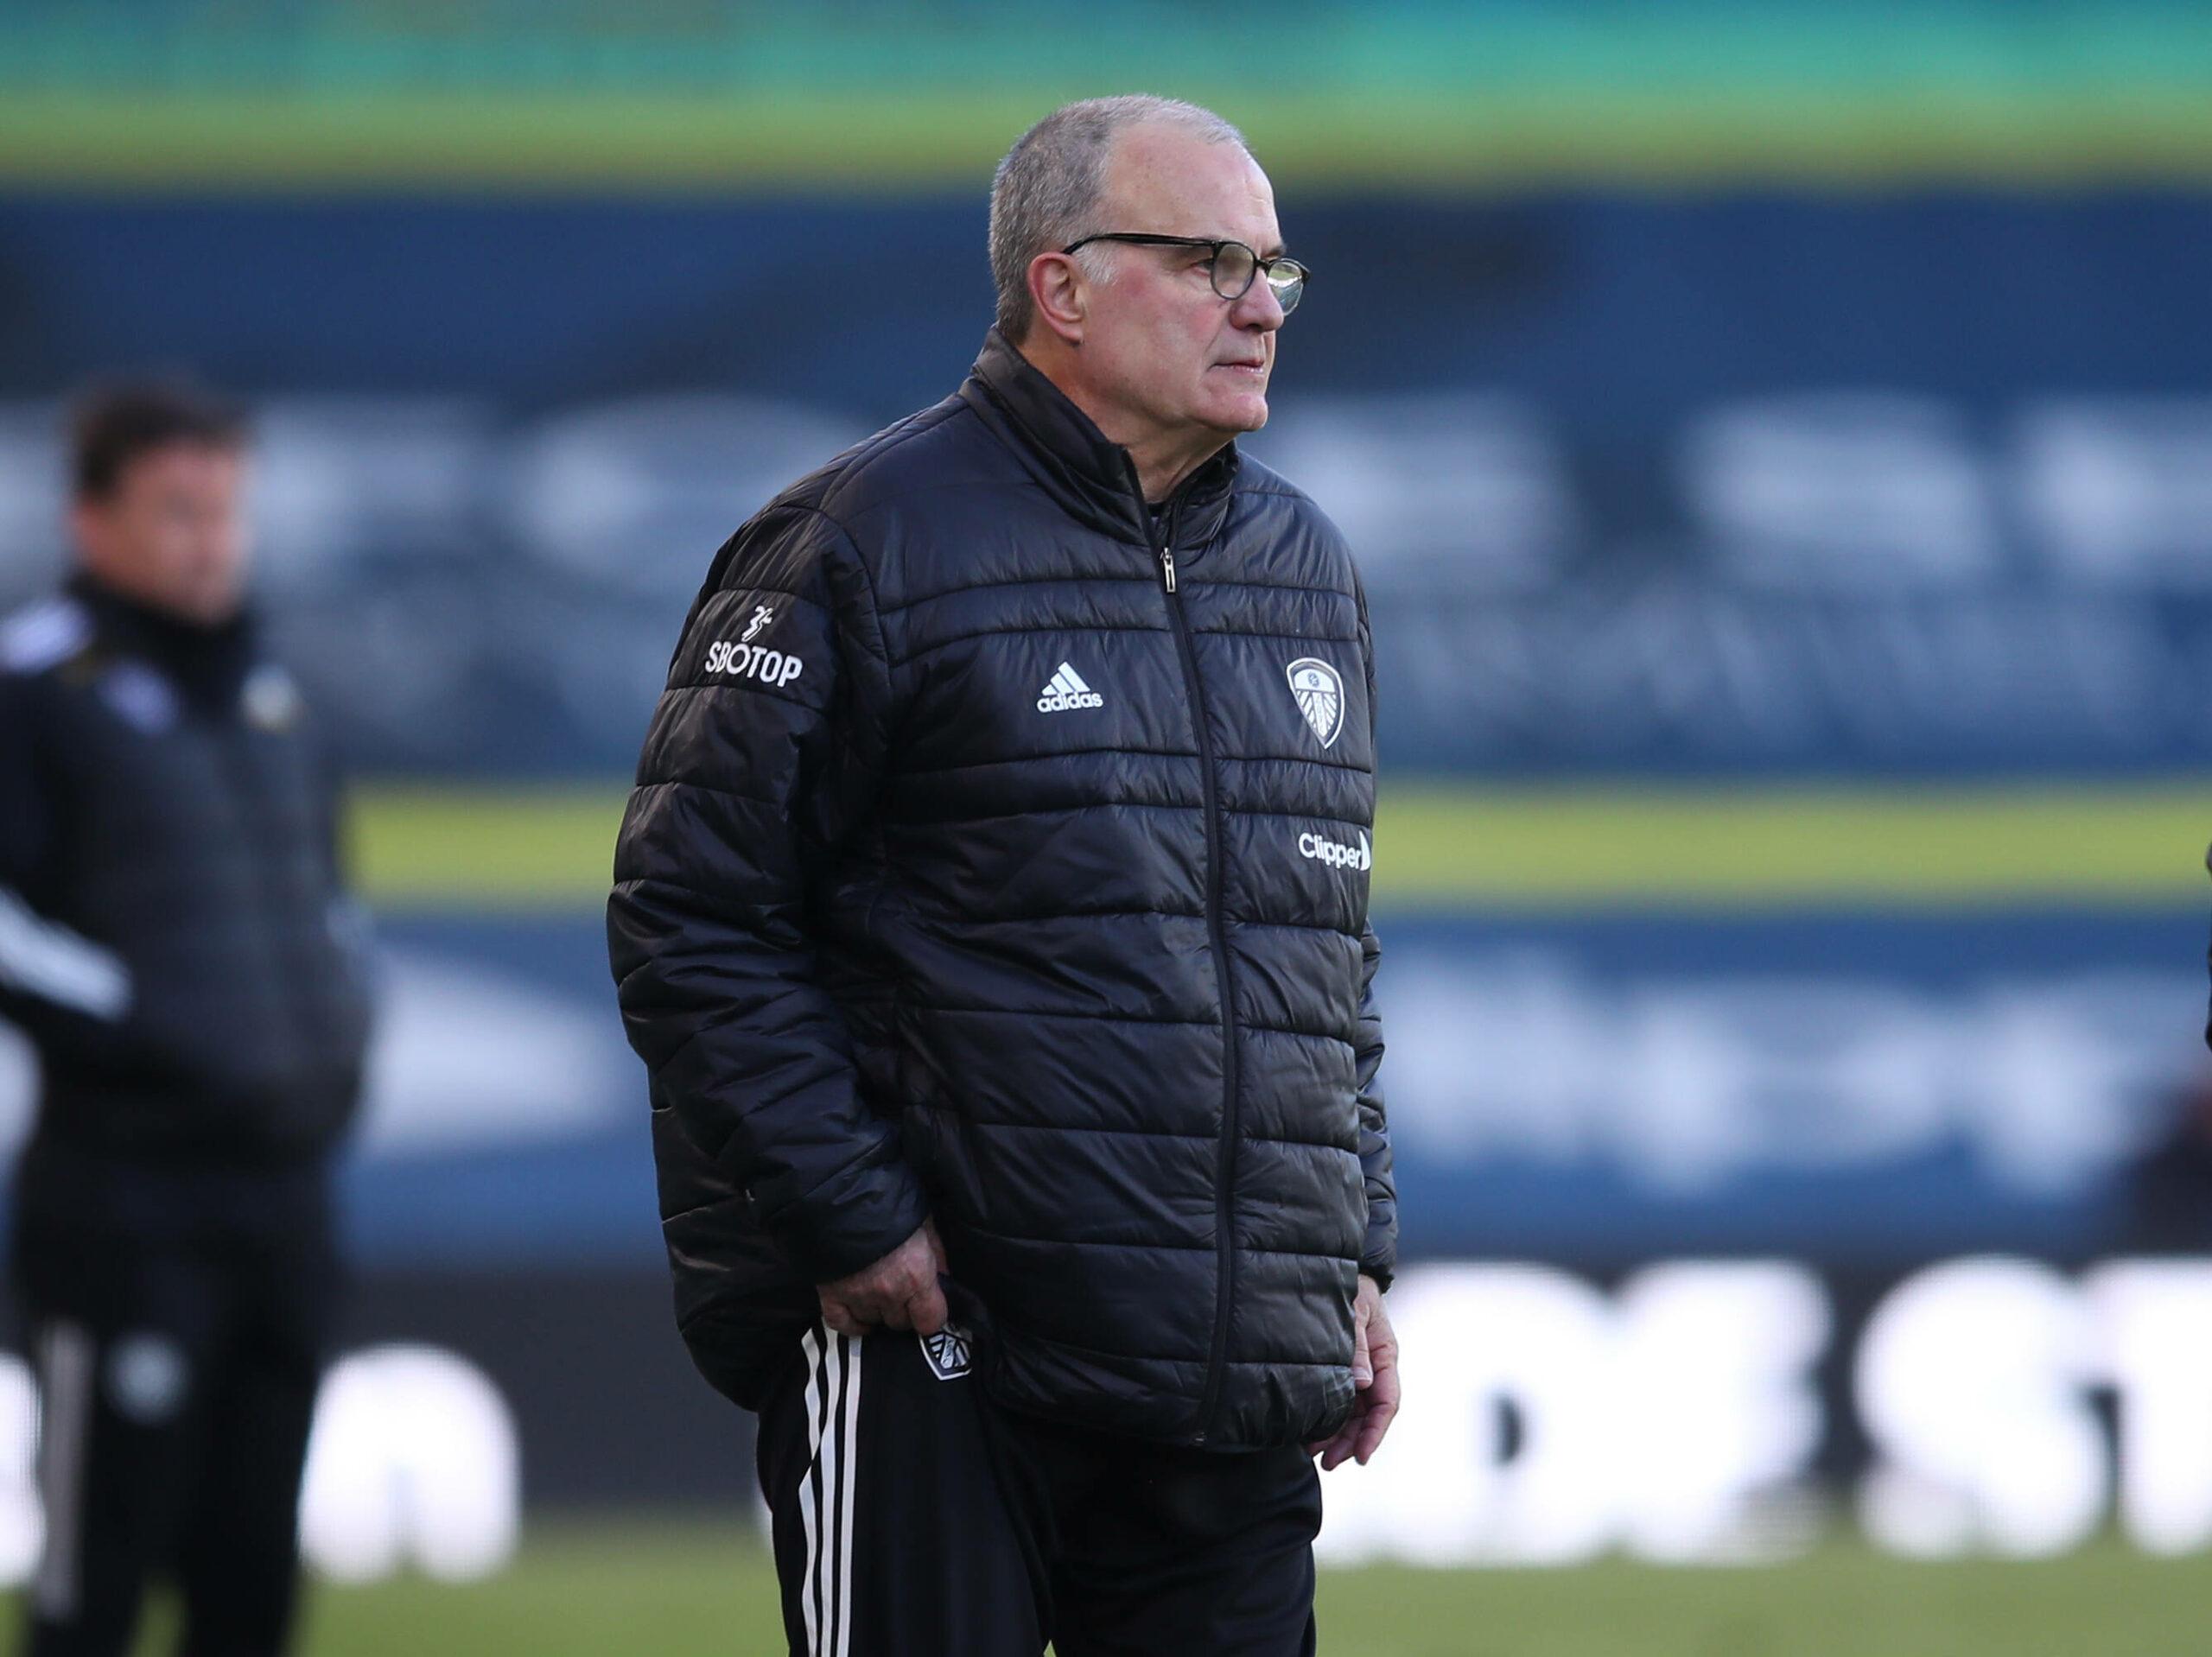 Marcelo Bielsa (Leeds United) beim Coaching